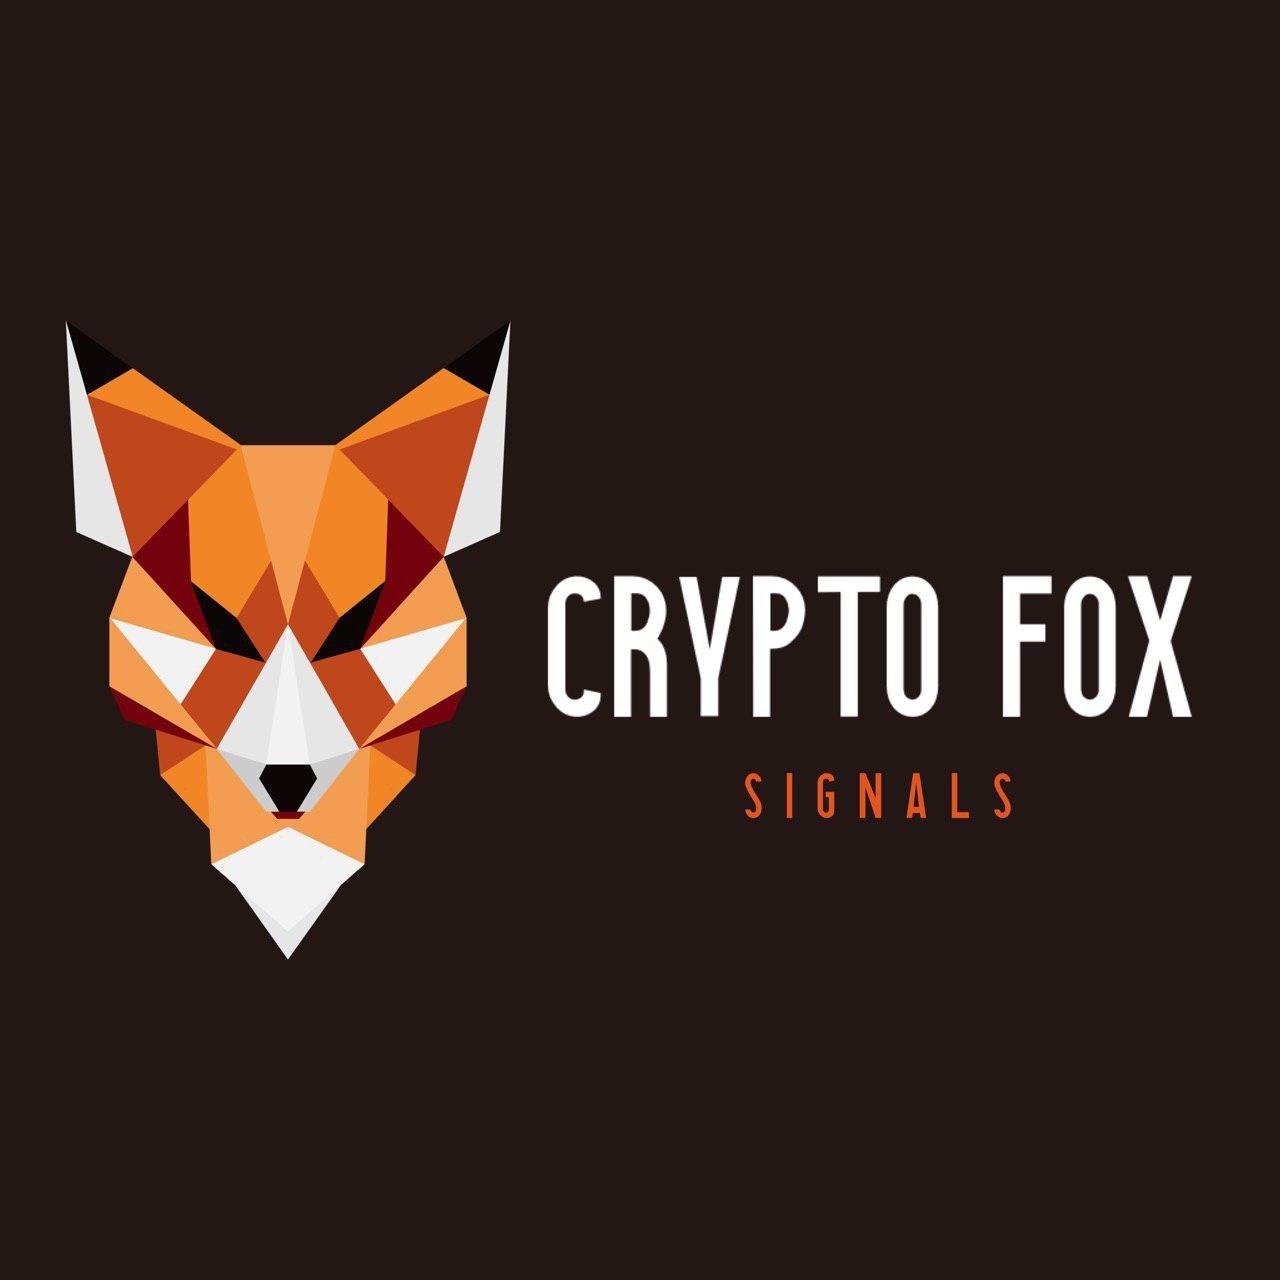 cryptofox buy cryptocurrency